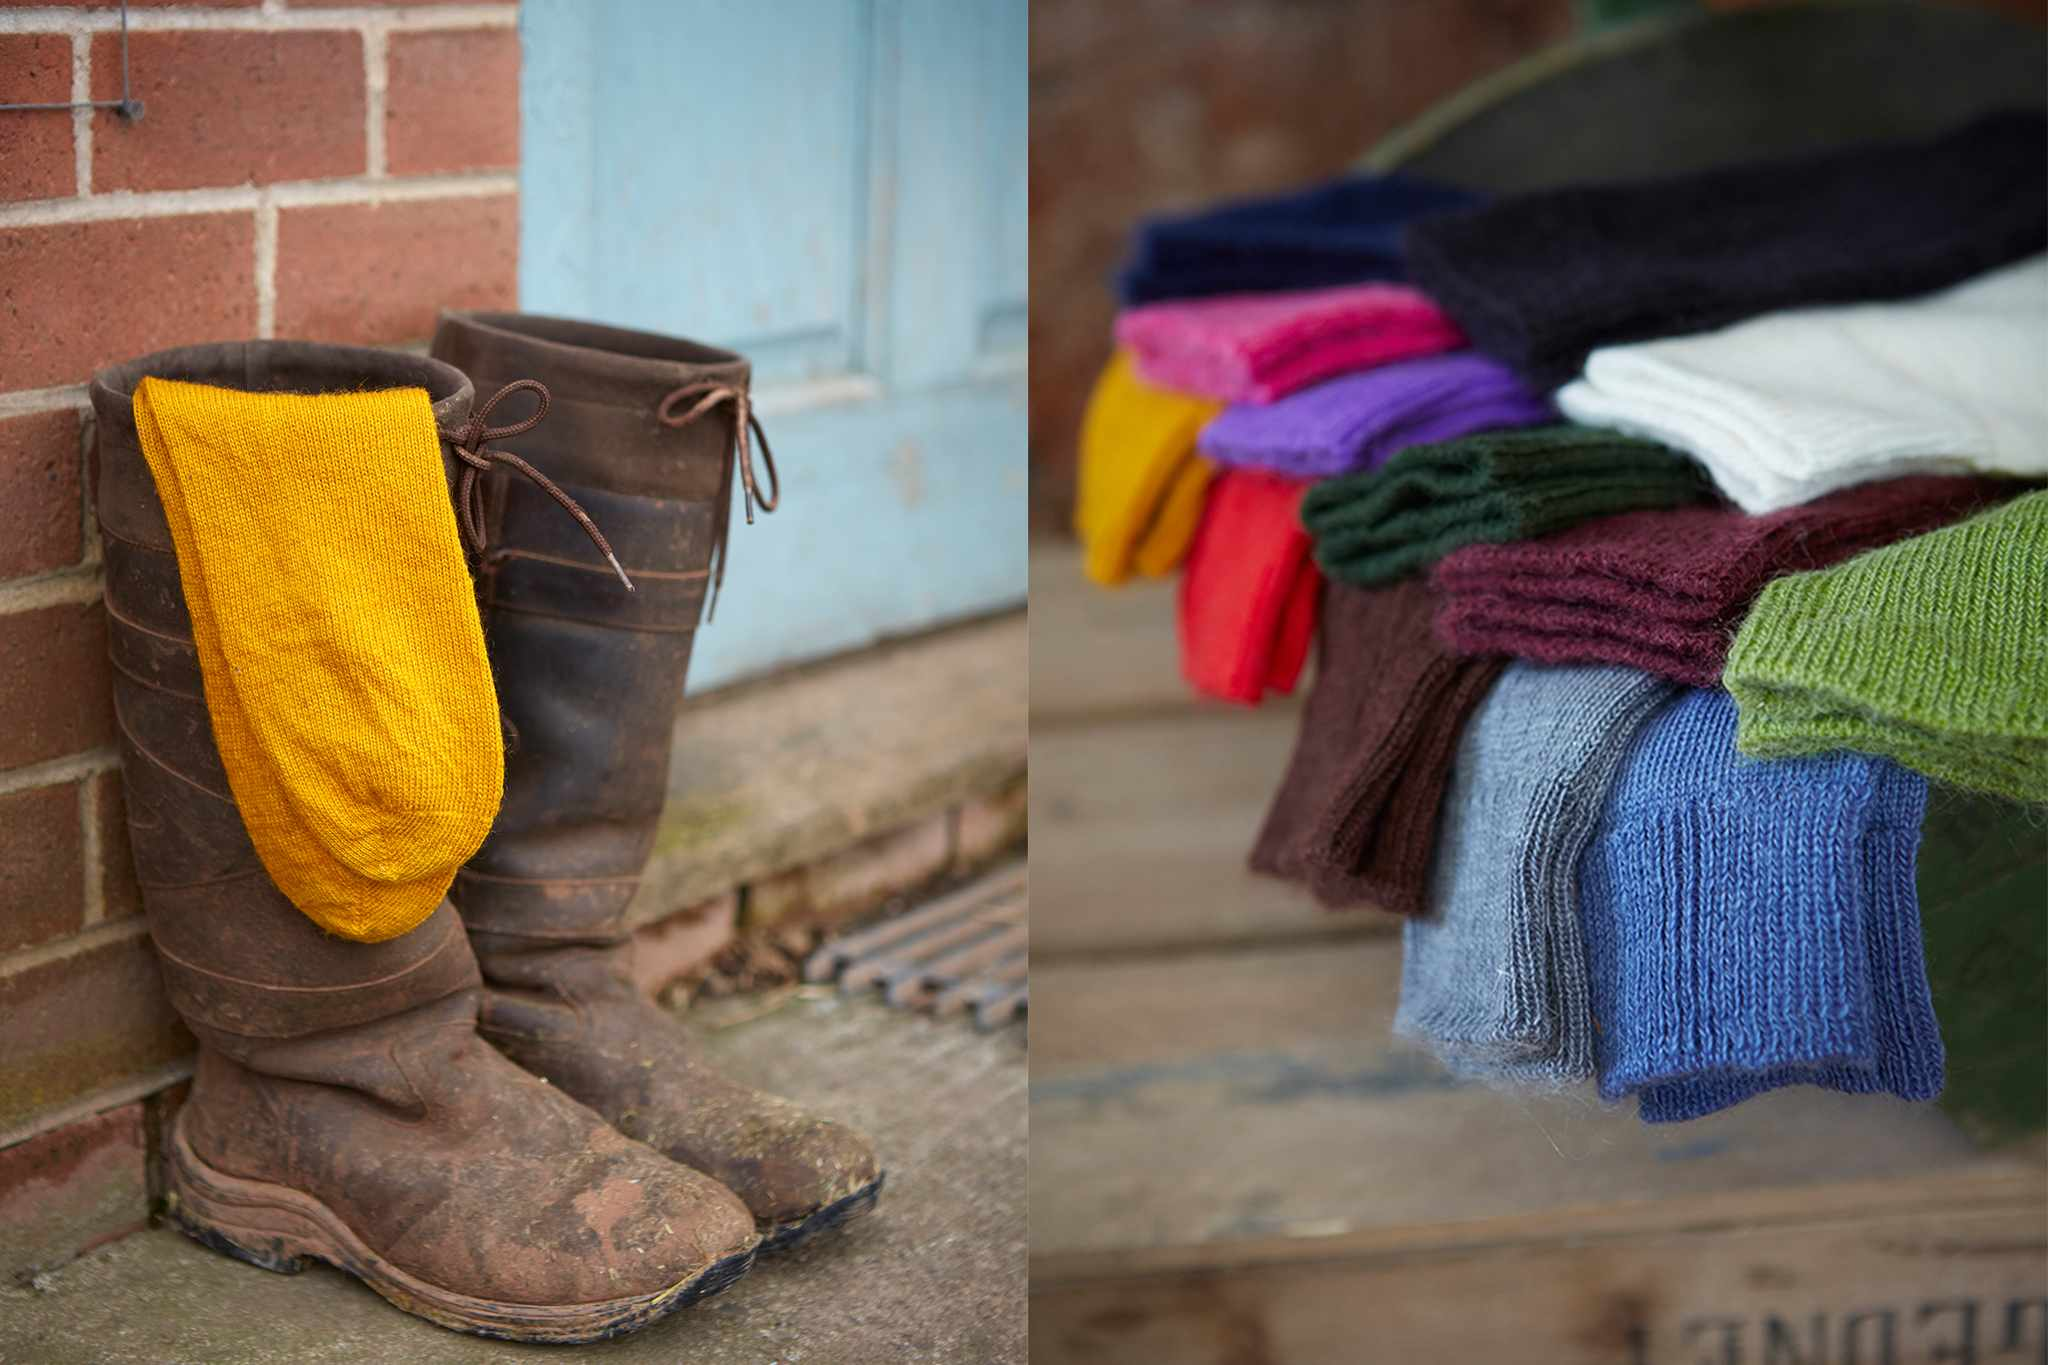 wiggly-wigglers-goat-socks-2048-1365